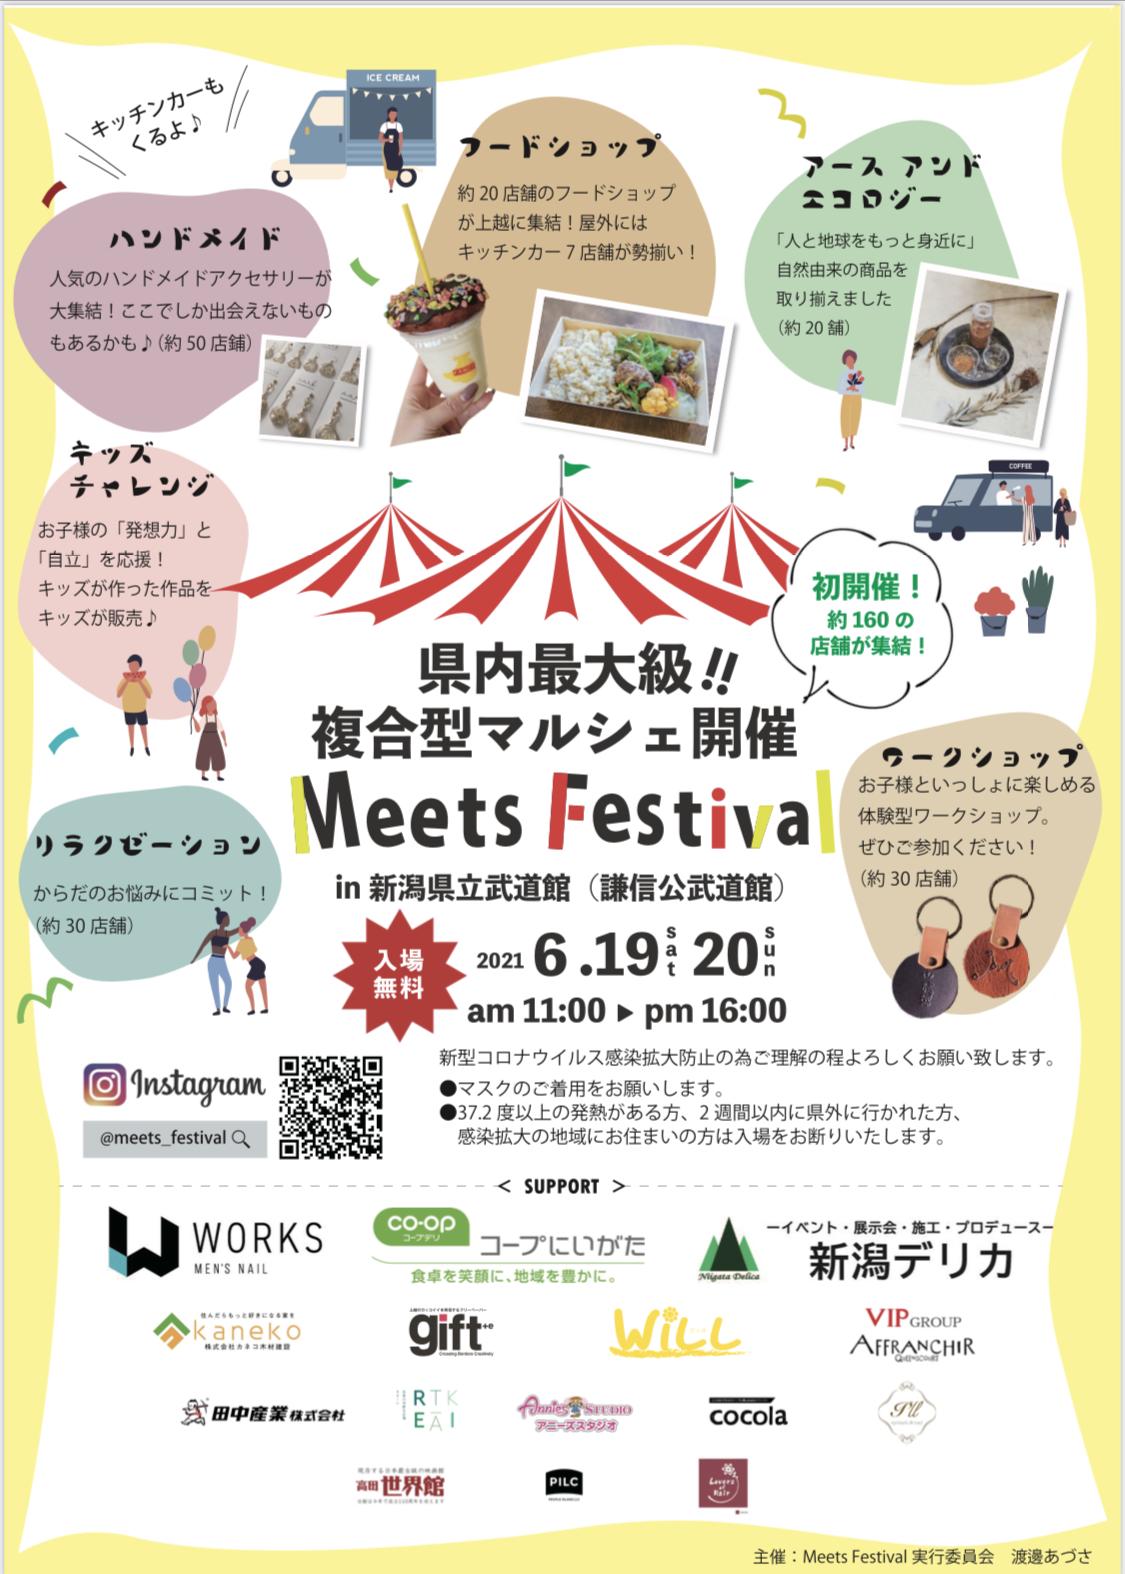 Meetsfestival